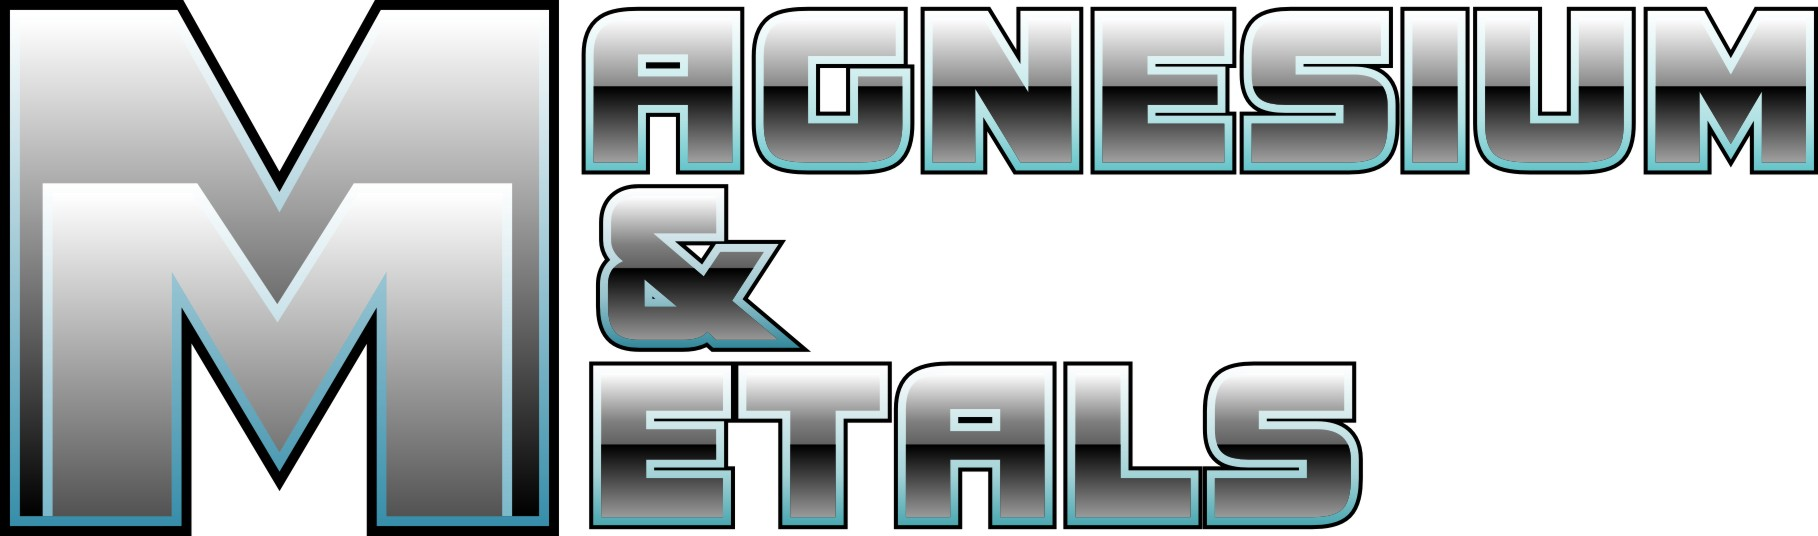 Логотип для проекта Magnesium&Metals фото f_4e7ae3cf6add4.jpg